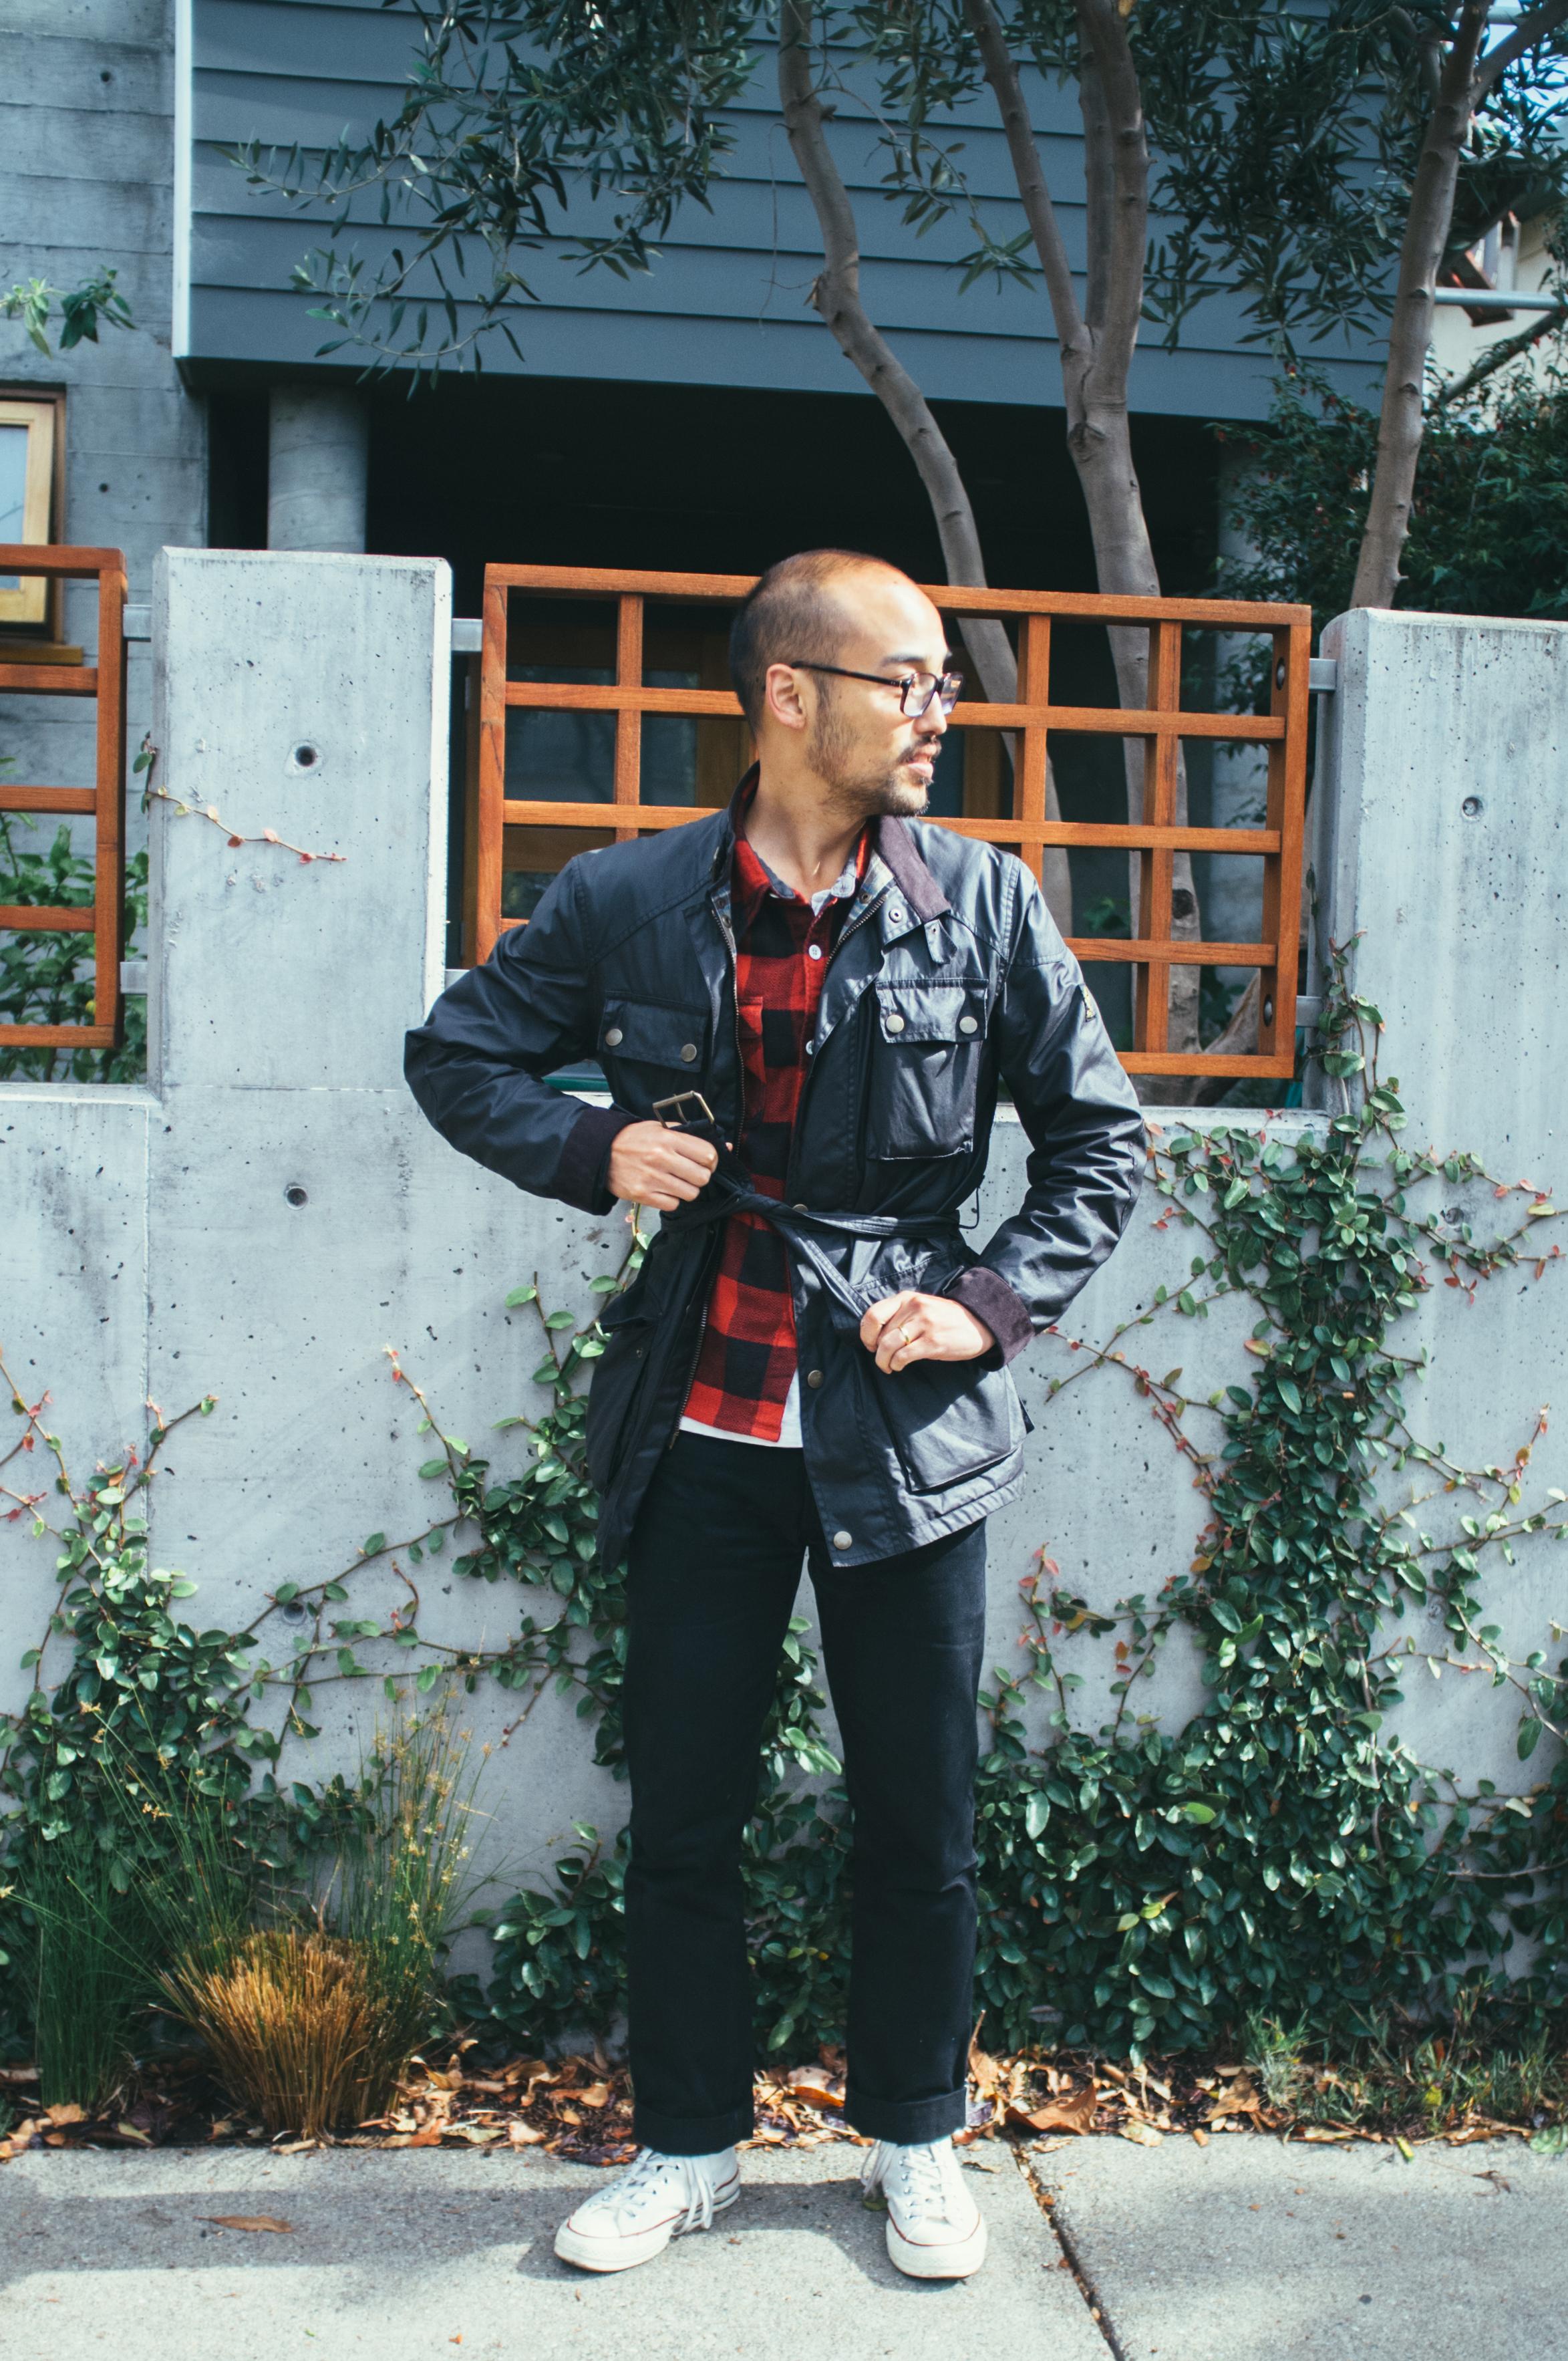 Glasses - JINS | Jacket -  Belstaff  | Shirt - The Flat Head | Henley - Levi's Vintage Clothing | Jeans -  3Sixteen  | Shoes -  Converse